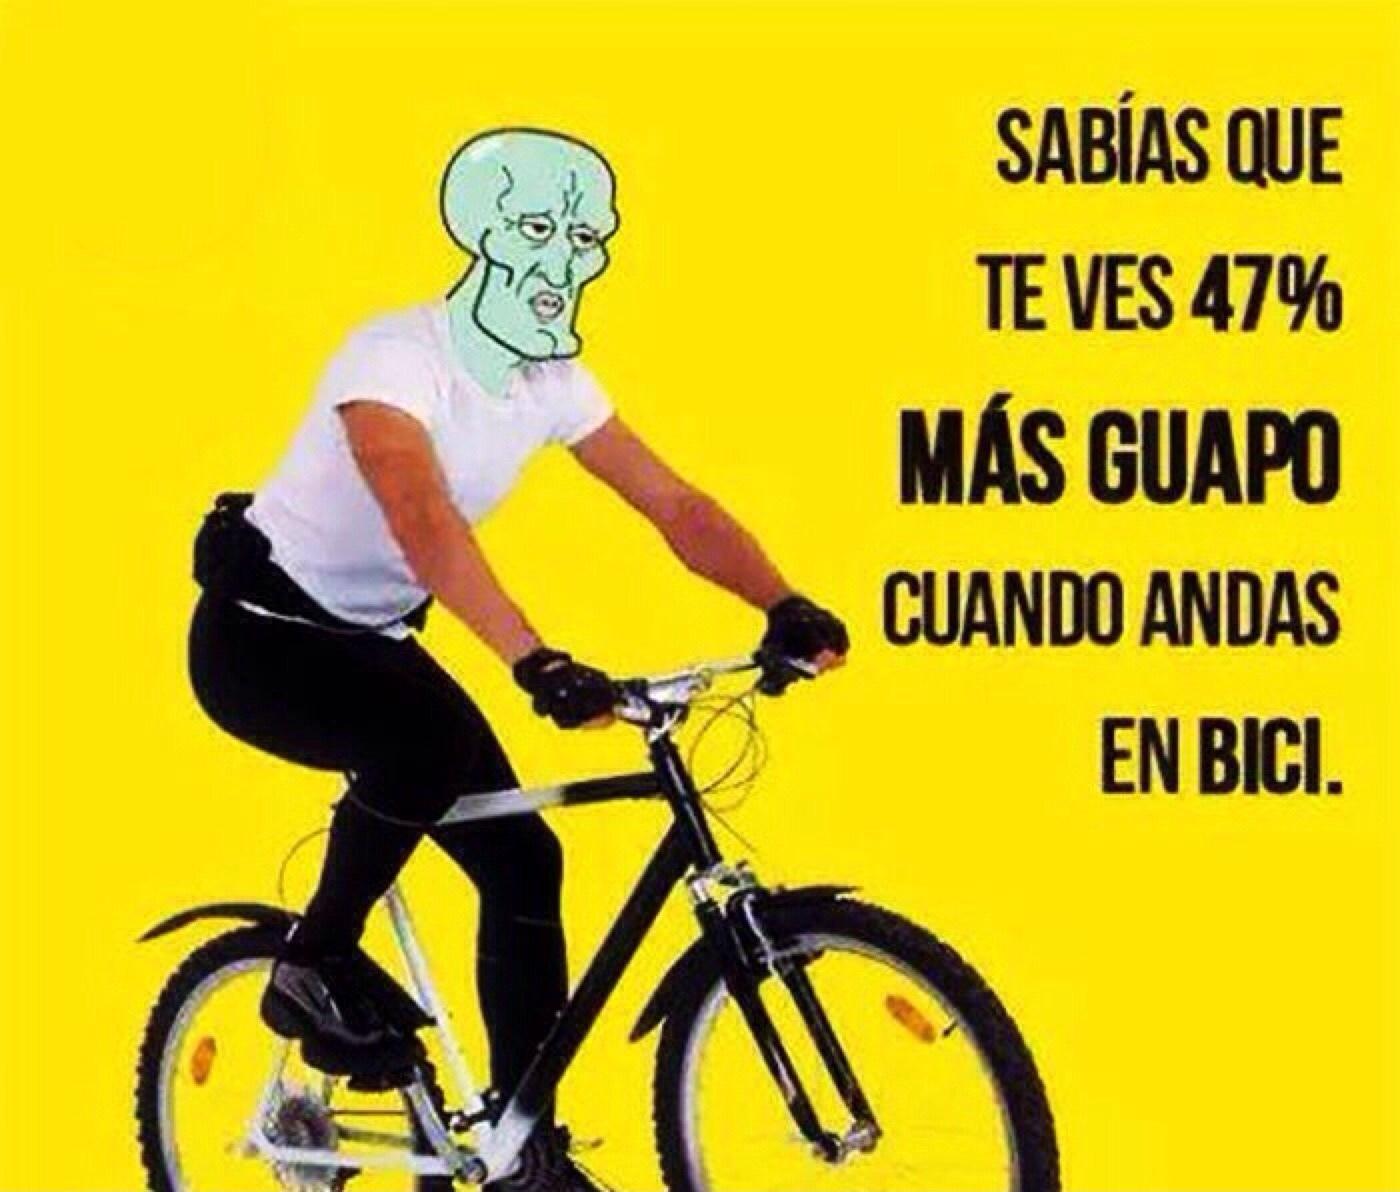 Anden en bicicleta ( ͡° ͜ʖ ͡°) - meme